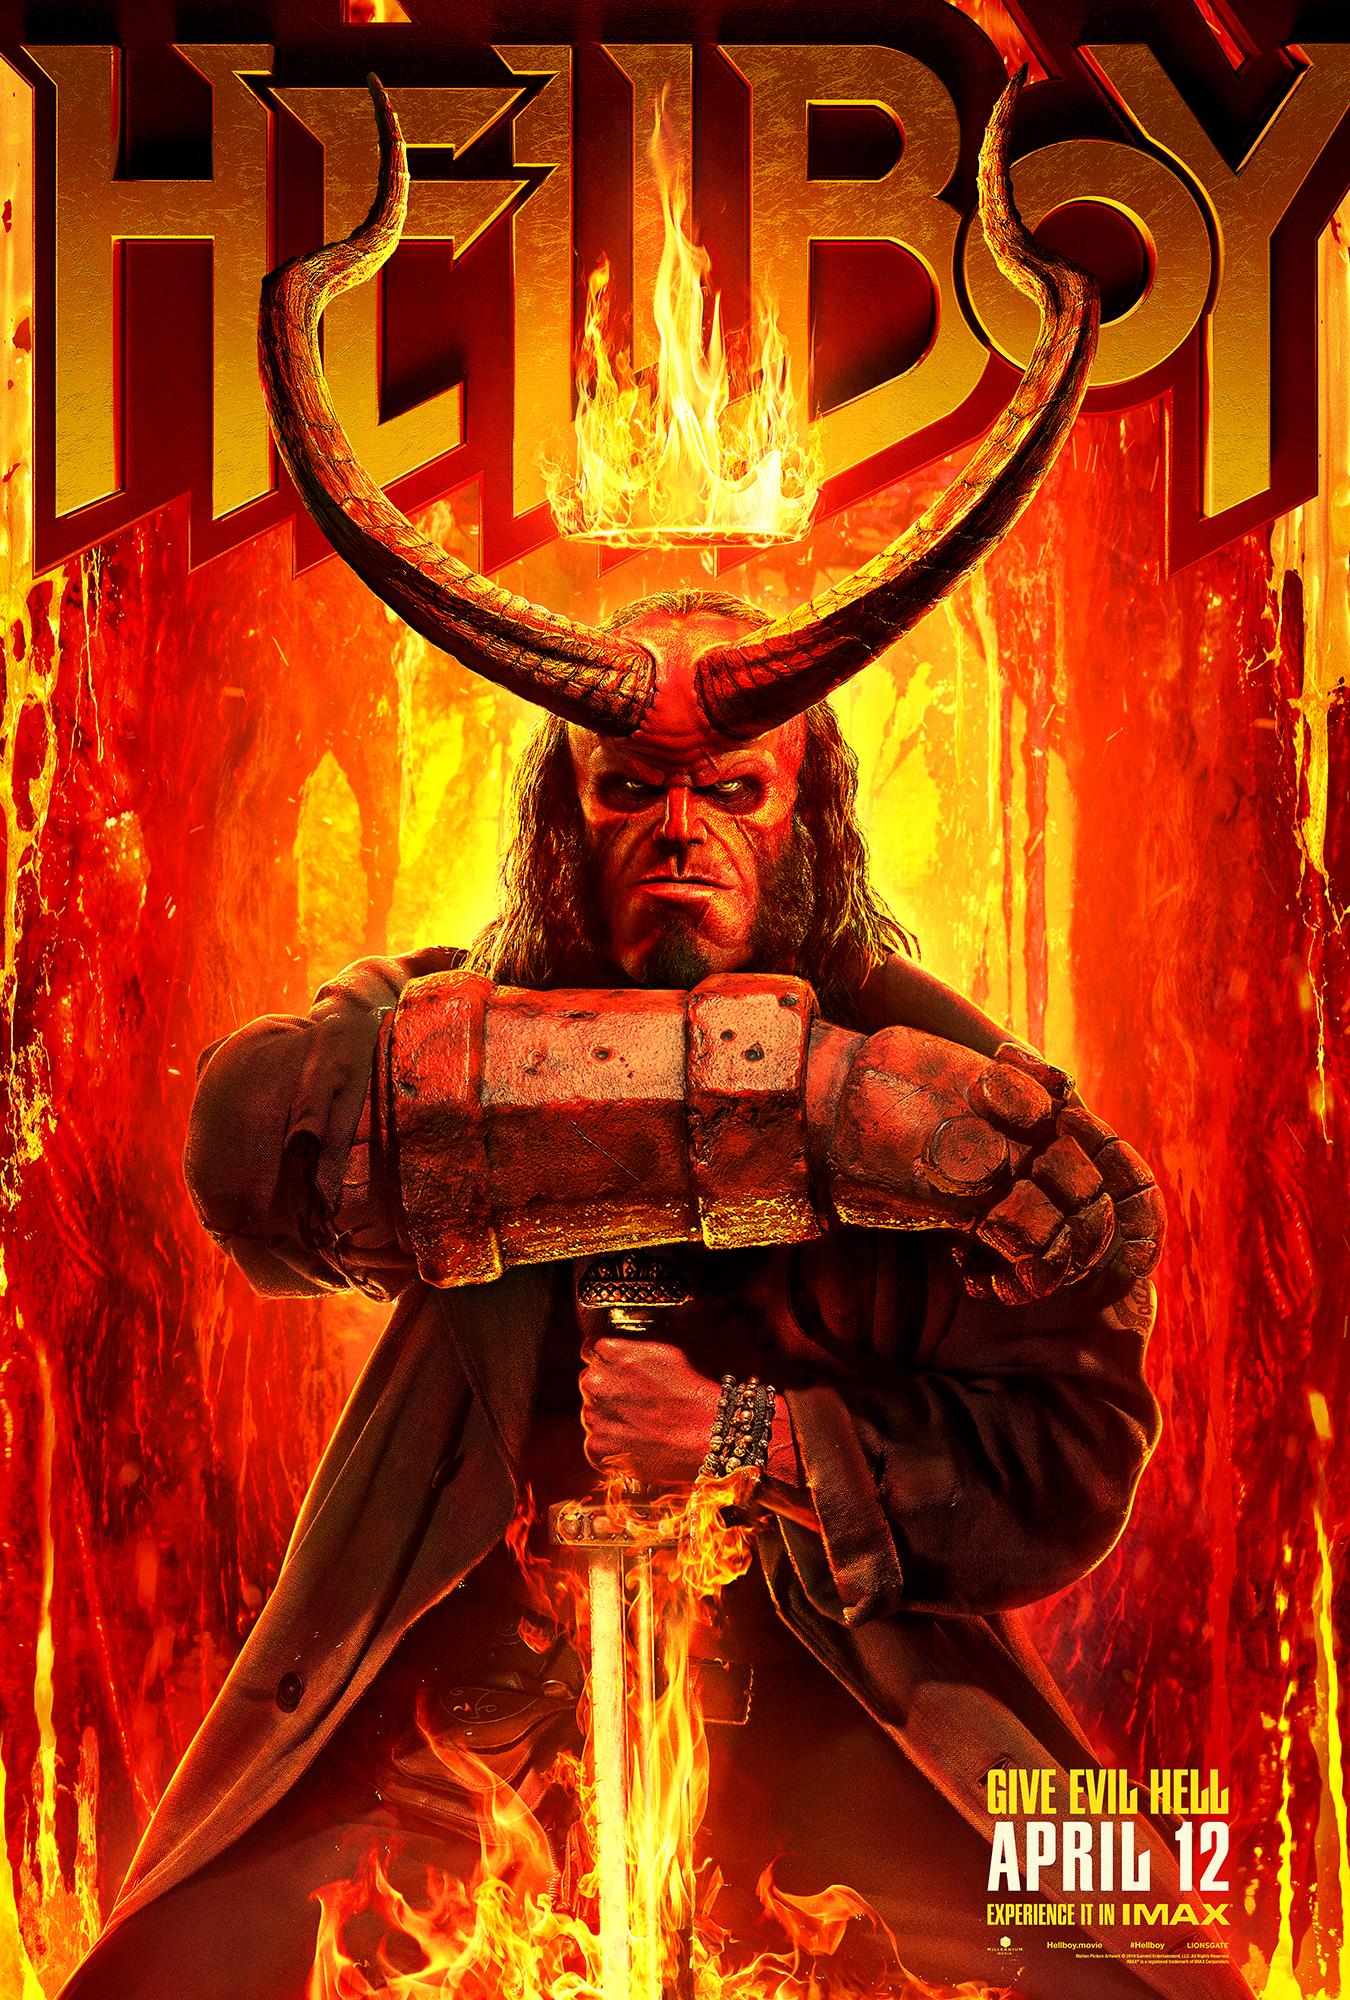 Hellboy_Online_1Sht_Crown_100dpi.jpg